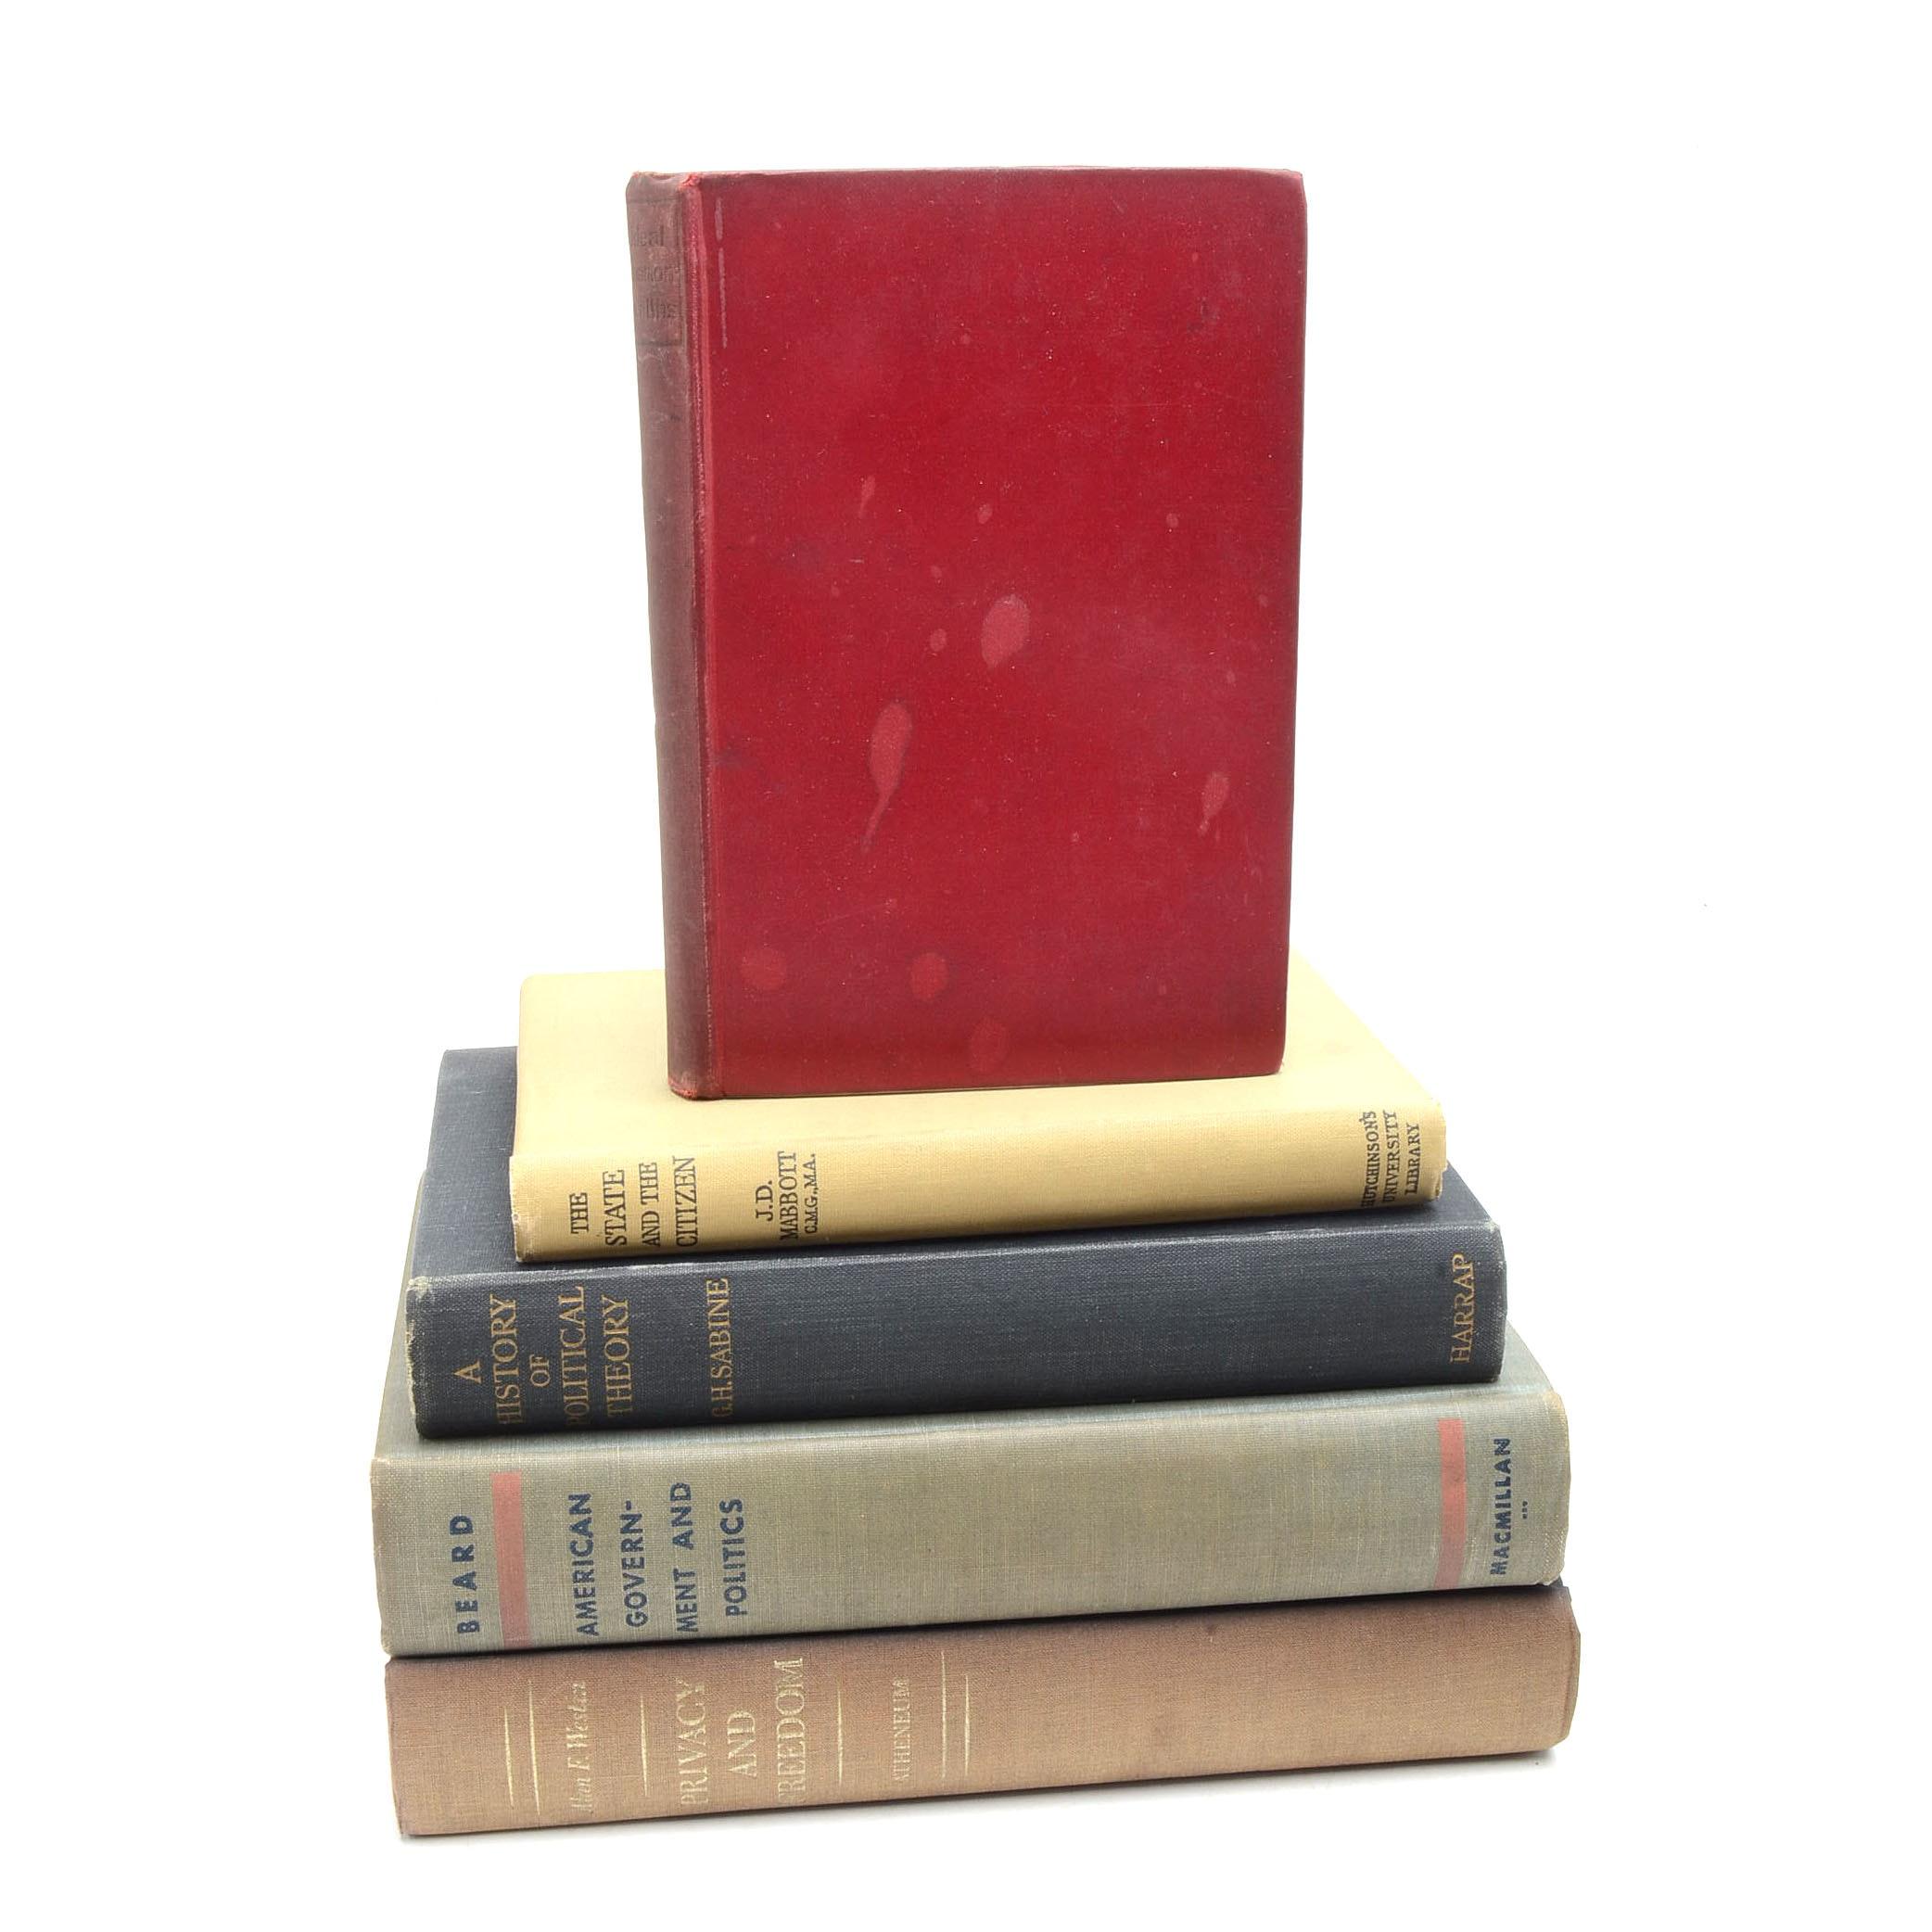 Vintage Political Science Books